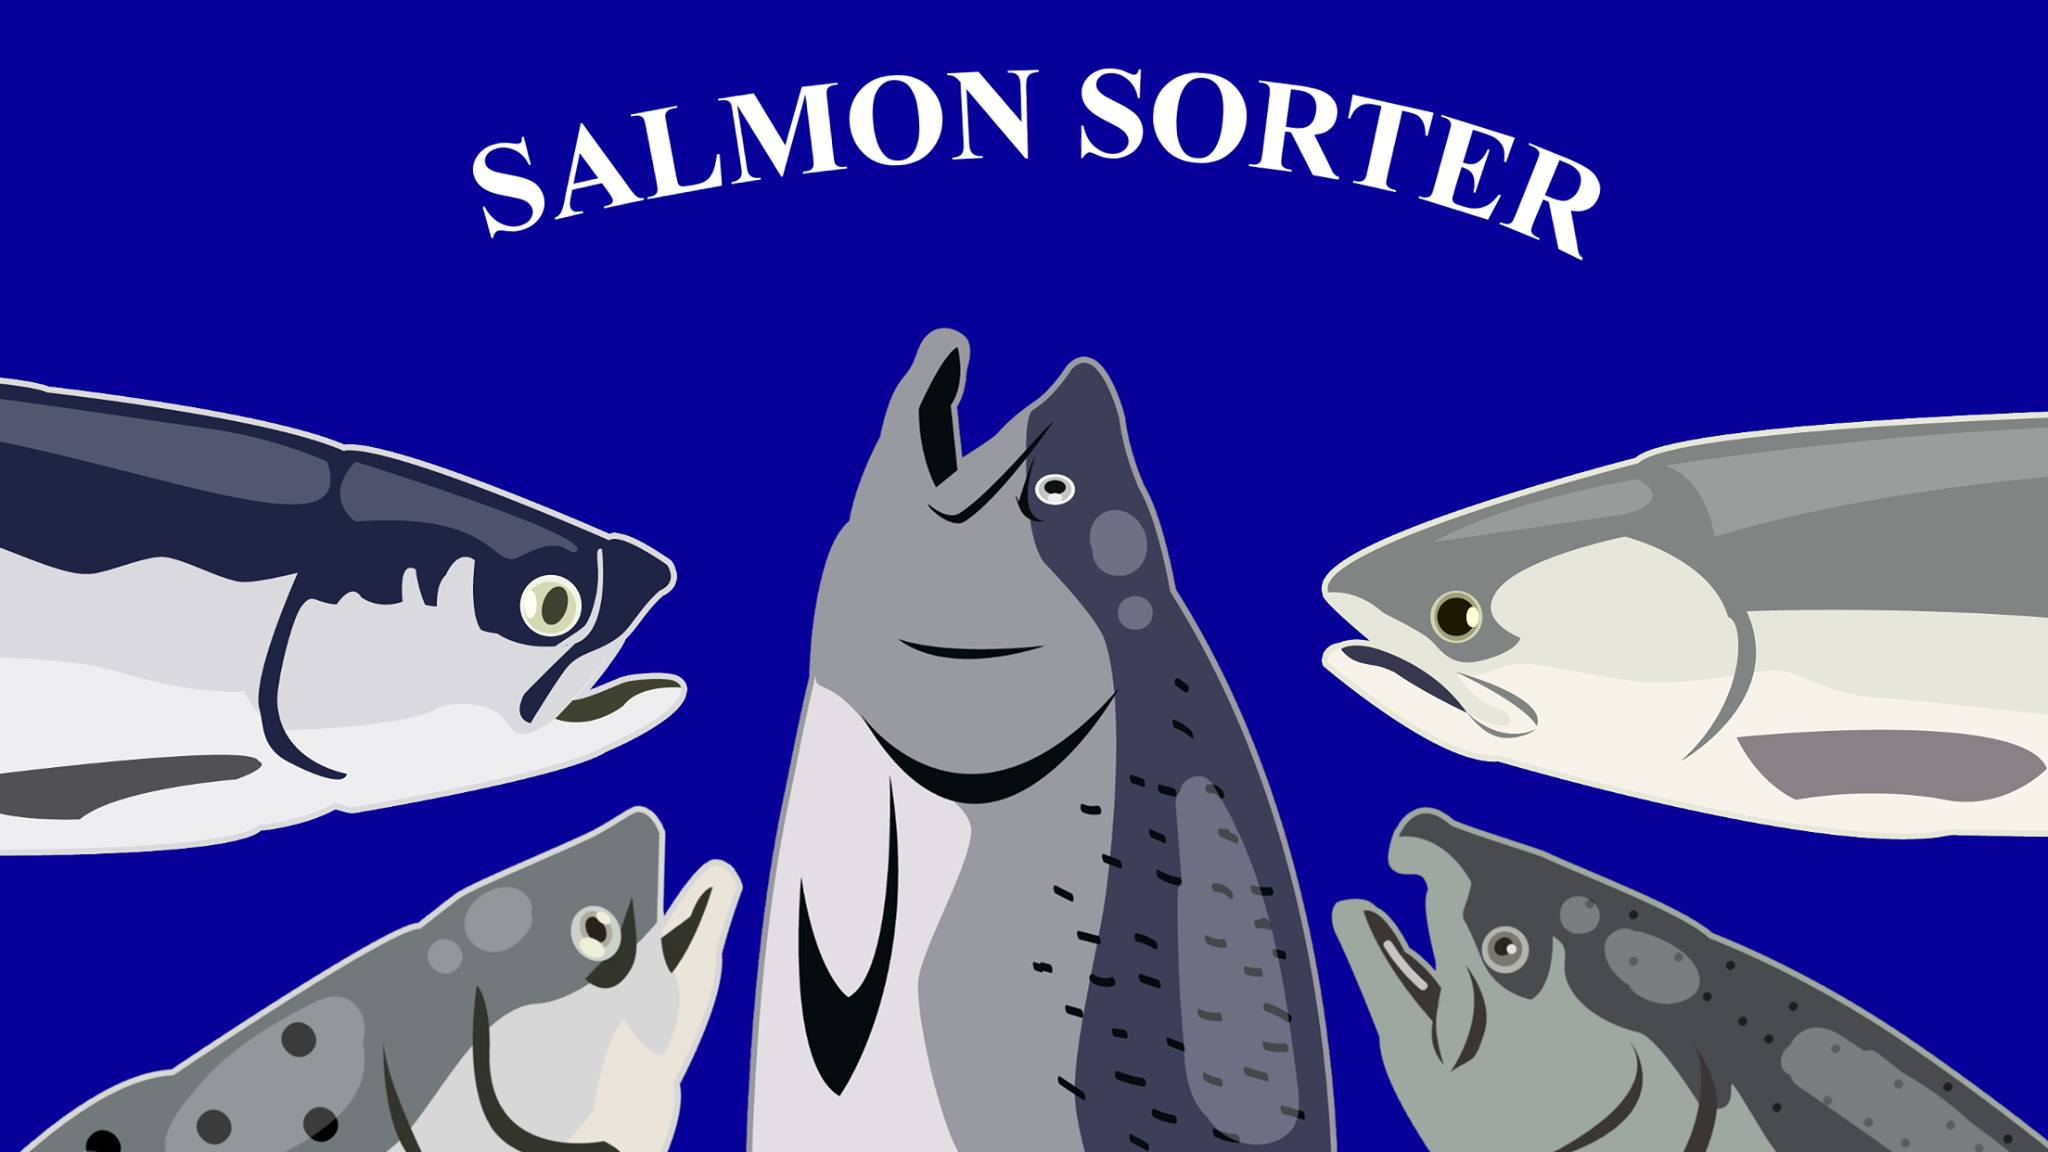 Salmon Sorter